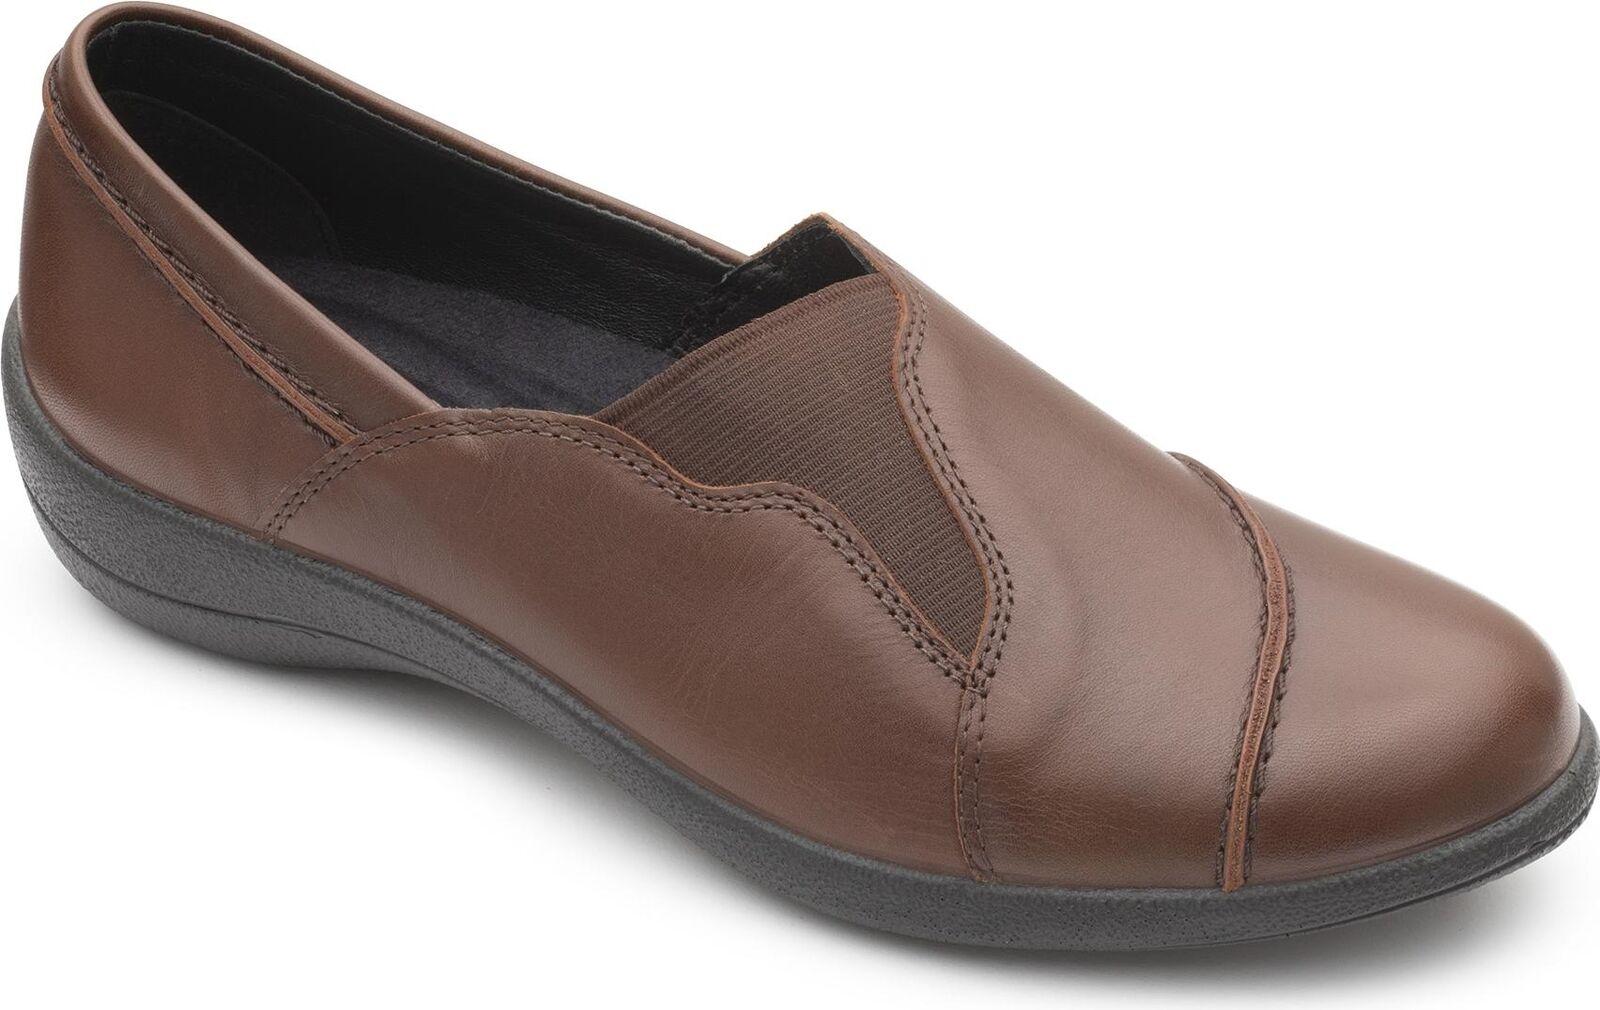 en femme Ruth Padders cuir Mocassins Tan Dark chaussures